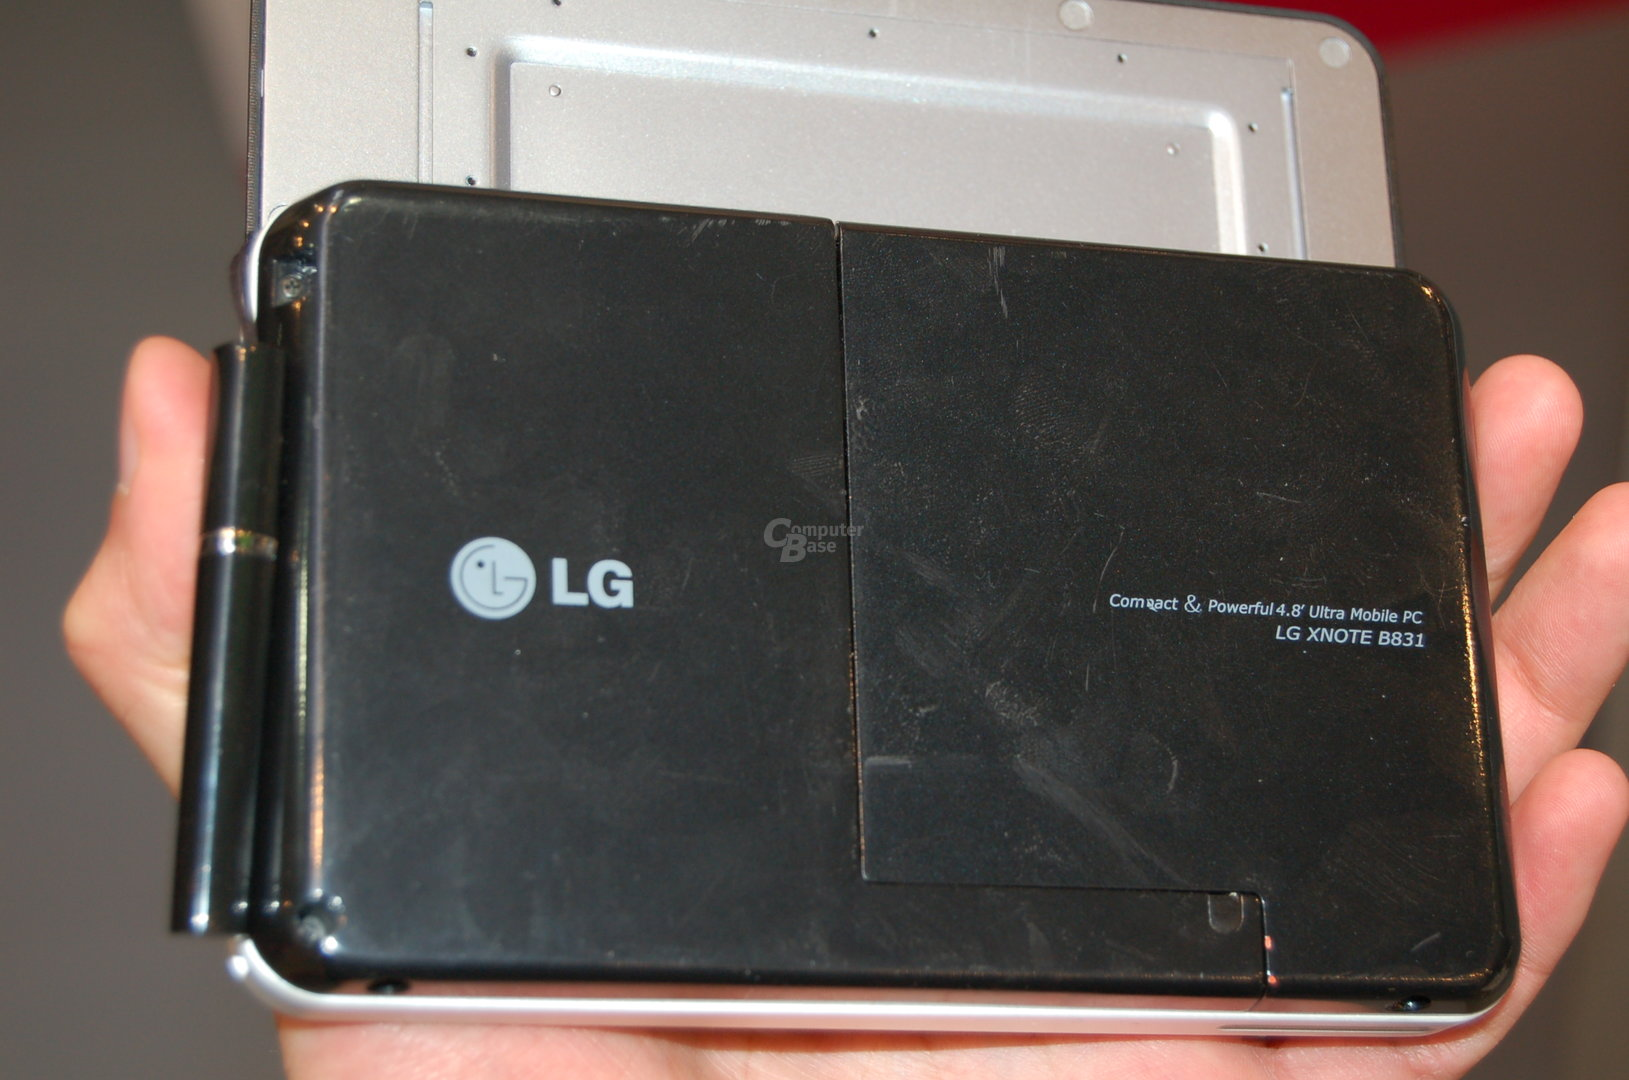 UMPC-Prototyp von LG